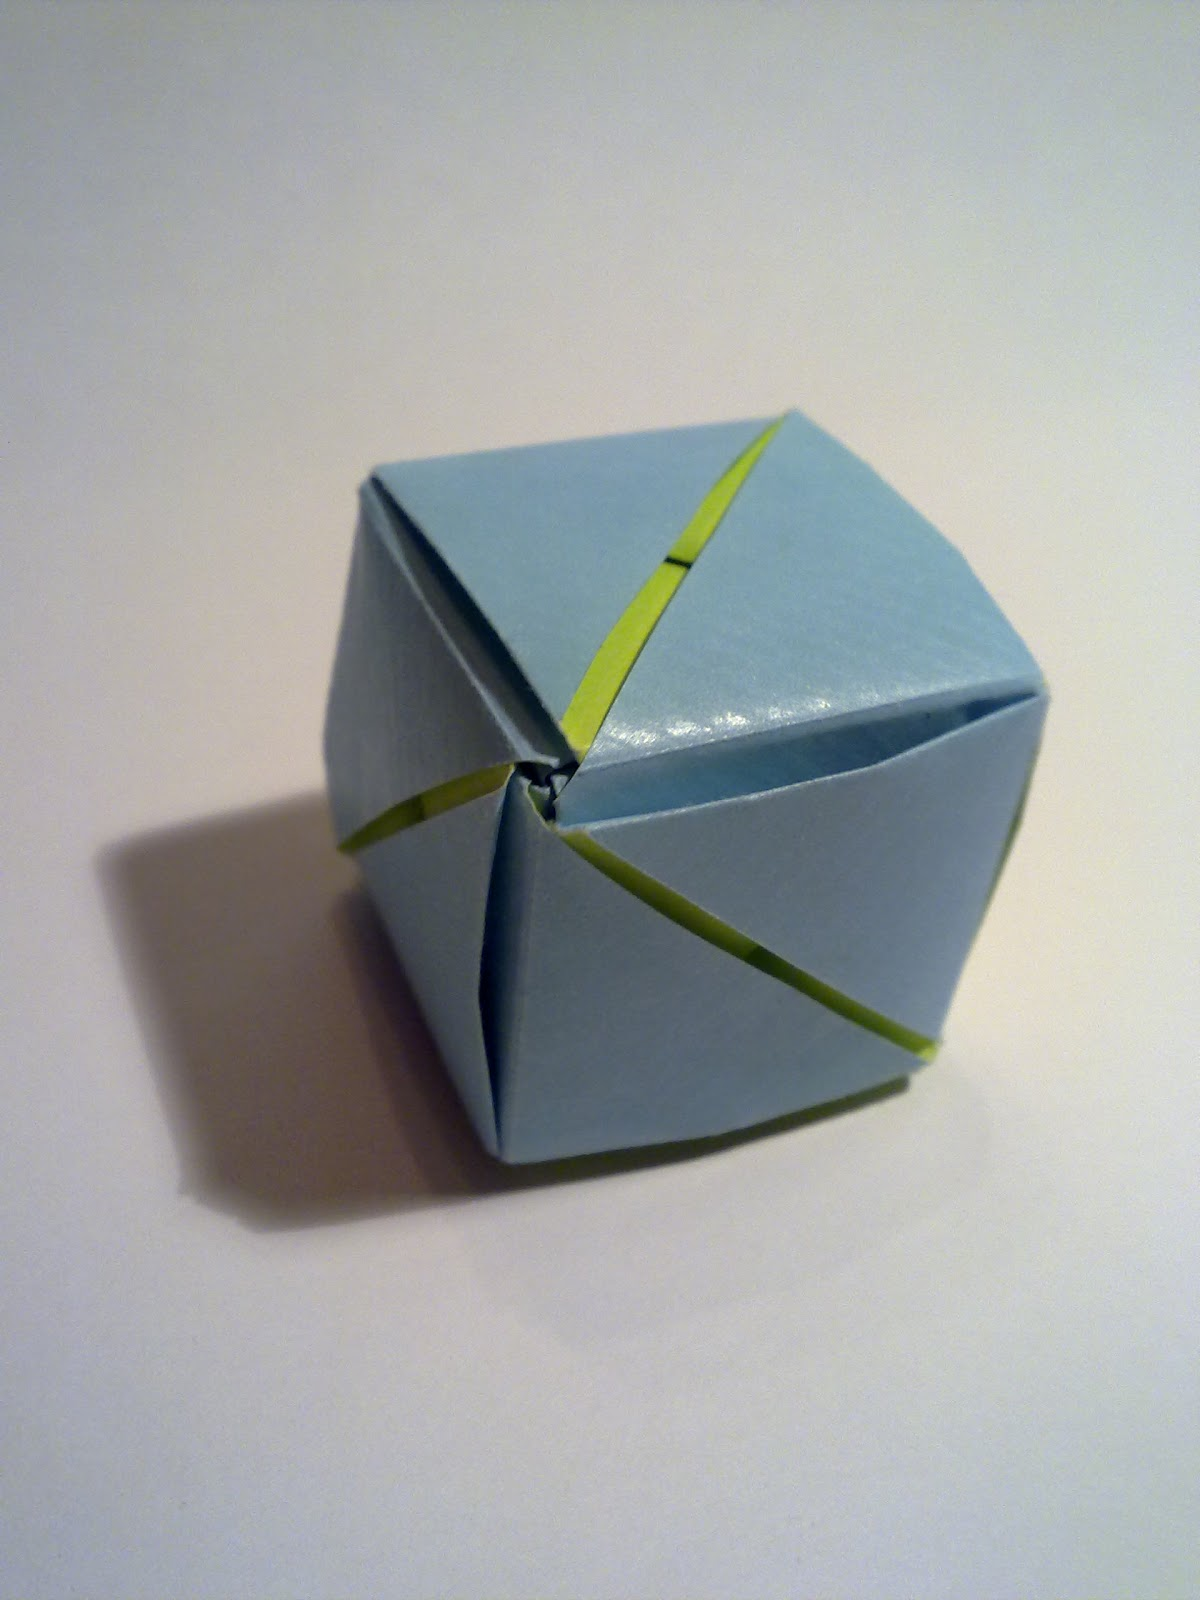 PaperBlog: Origami: Magic Rose Cube - photo#10